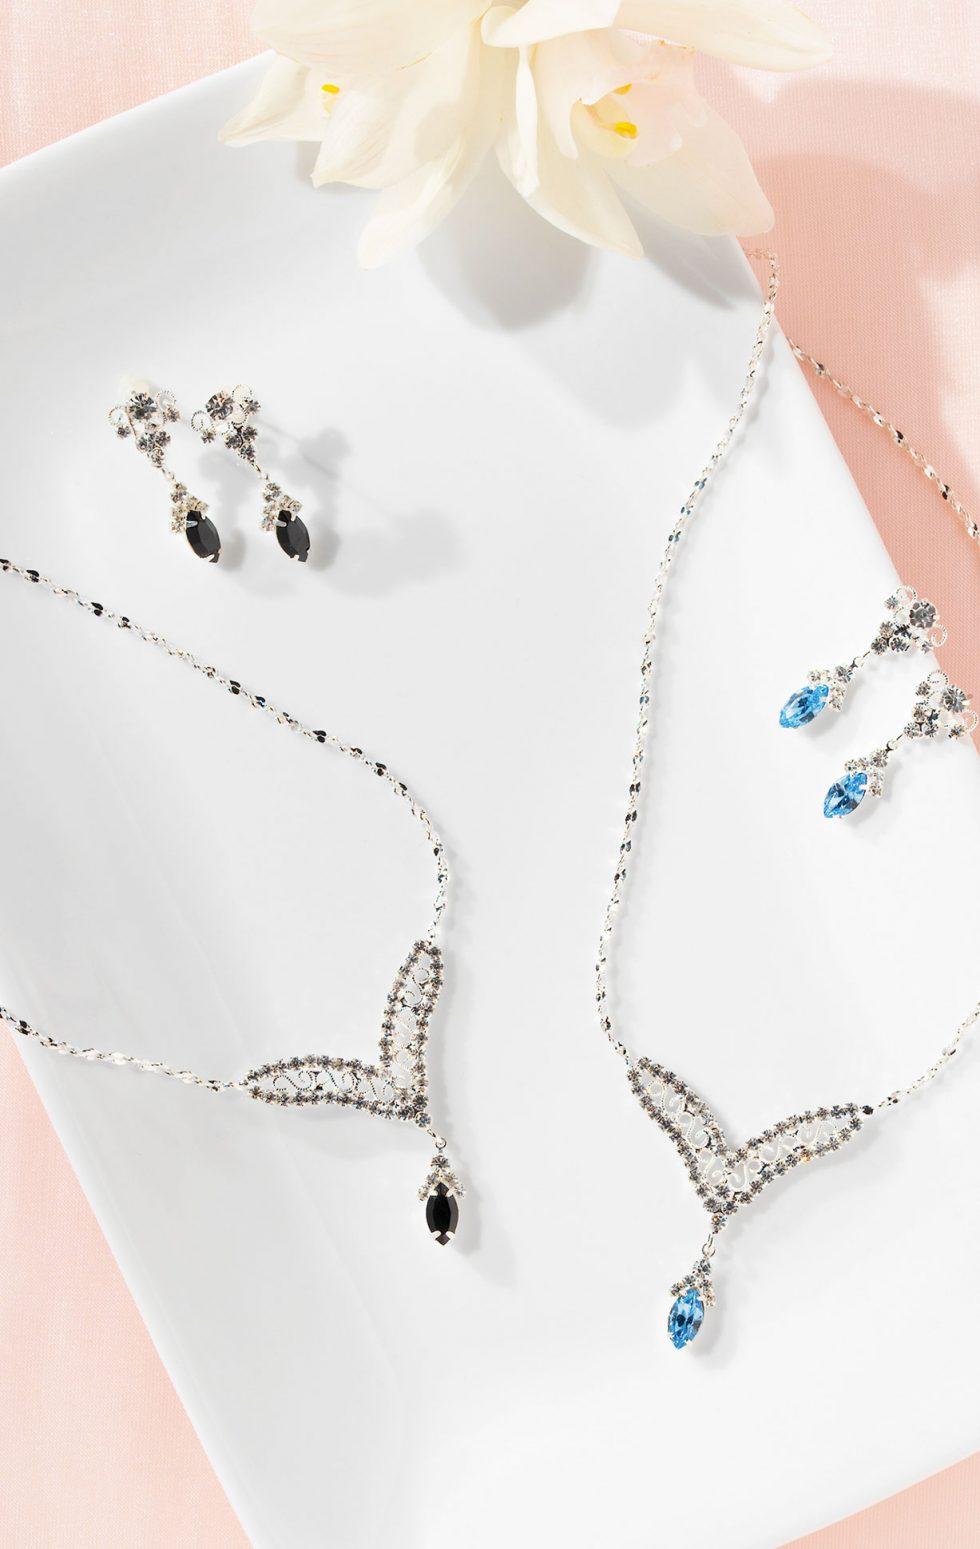 Calgary Product Photographer. Elegant jewelry on a soft backdrop.